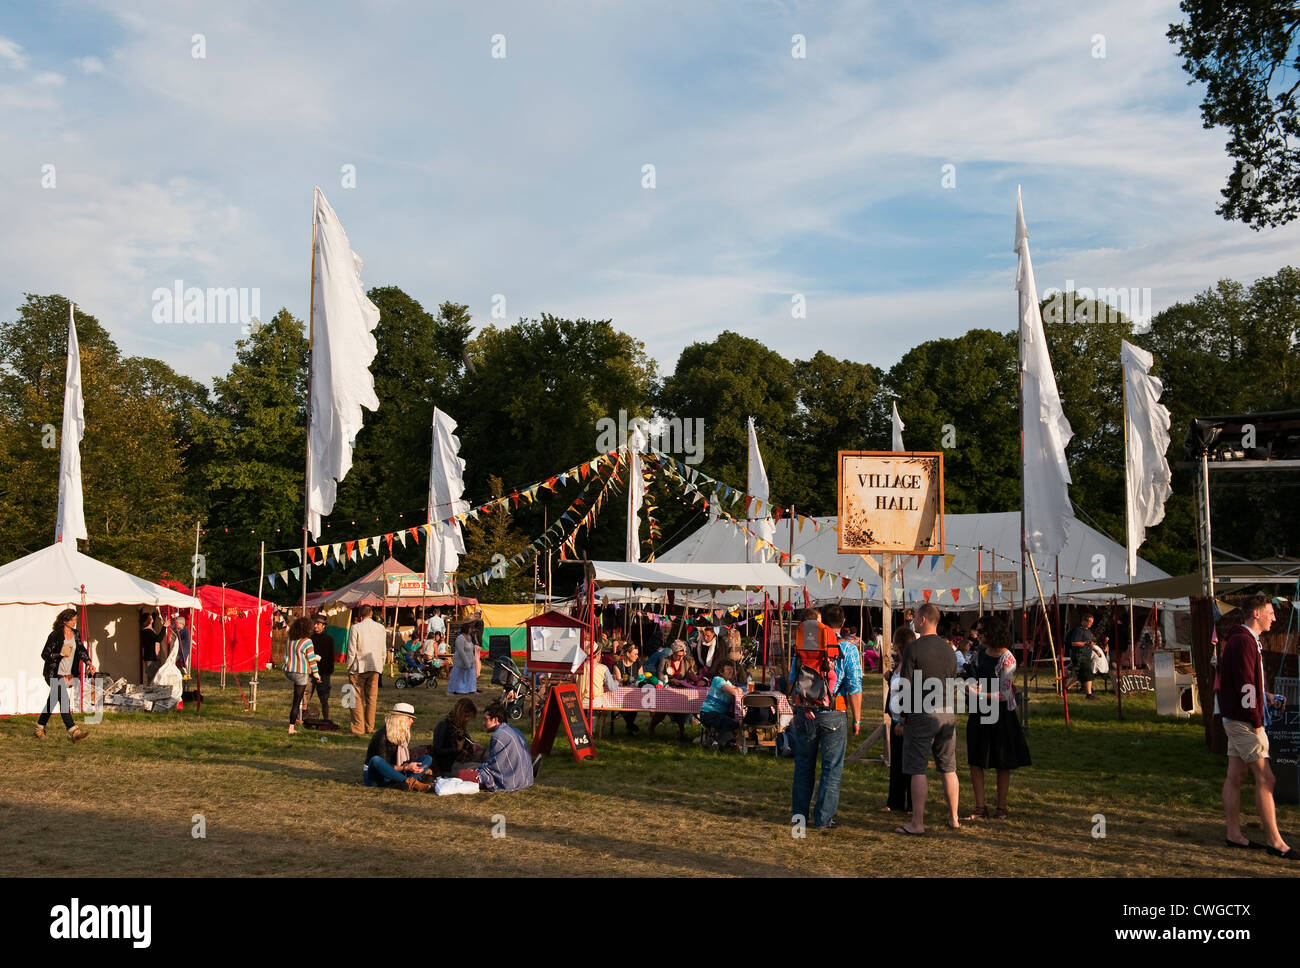 Wilderness Festival 2012, Cornbury, UK. The Village Hall tent - Stock Image